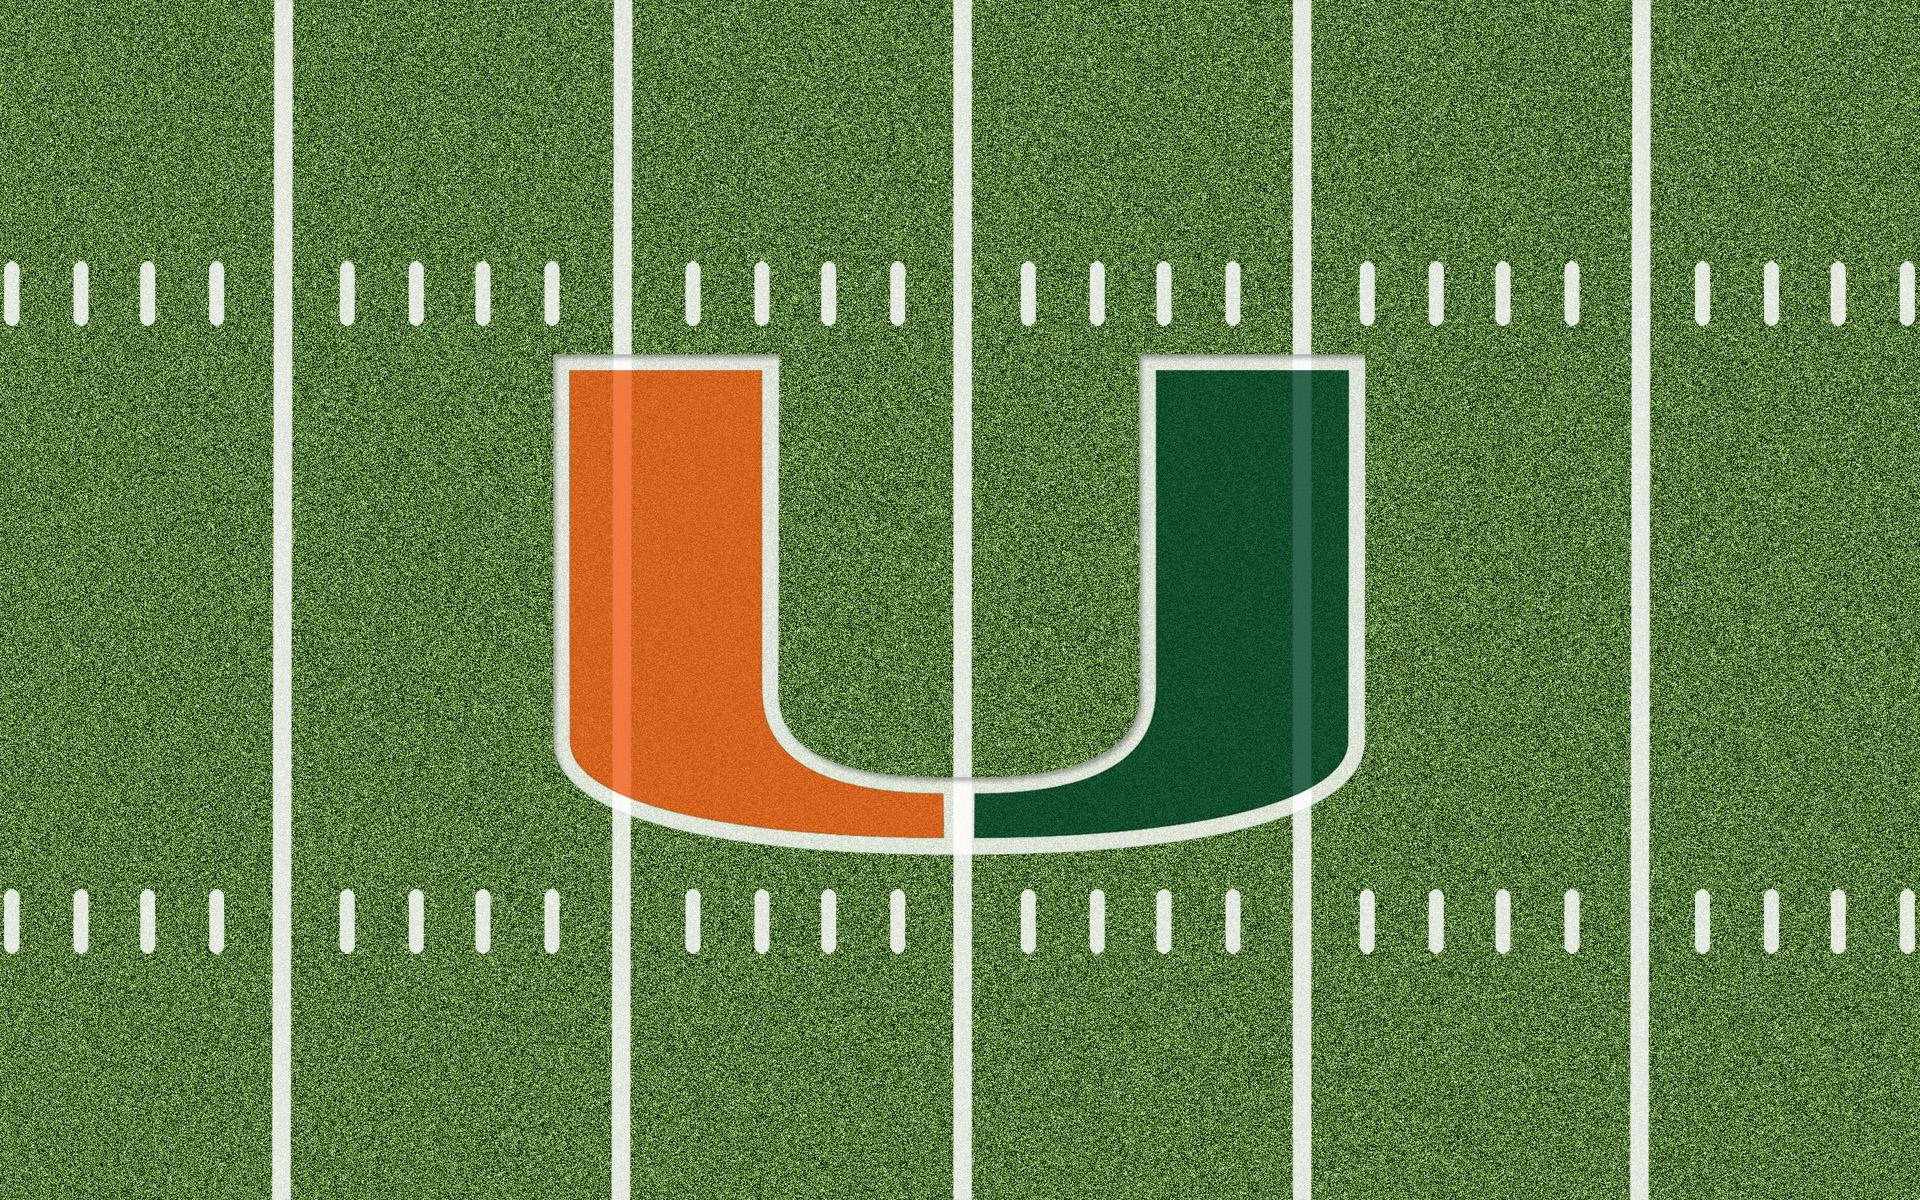 Miami hurricanes huge favorite over florida atlantic in opener miami hurricanes football voltagebd Choice Image